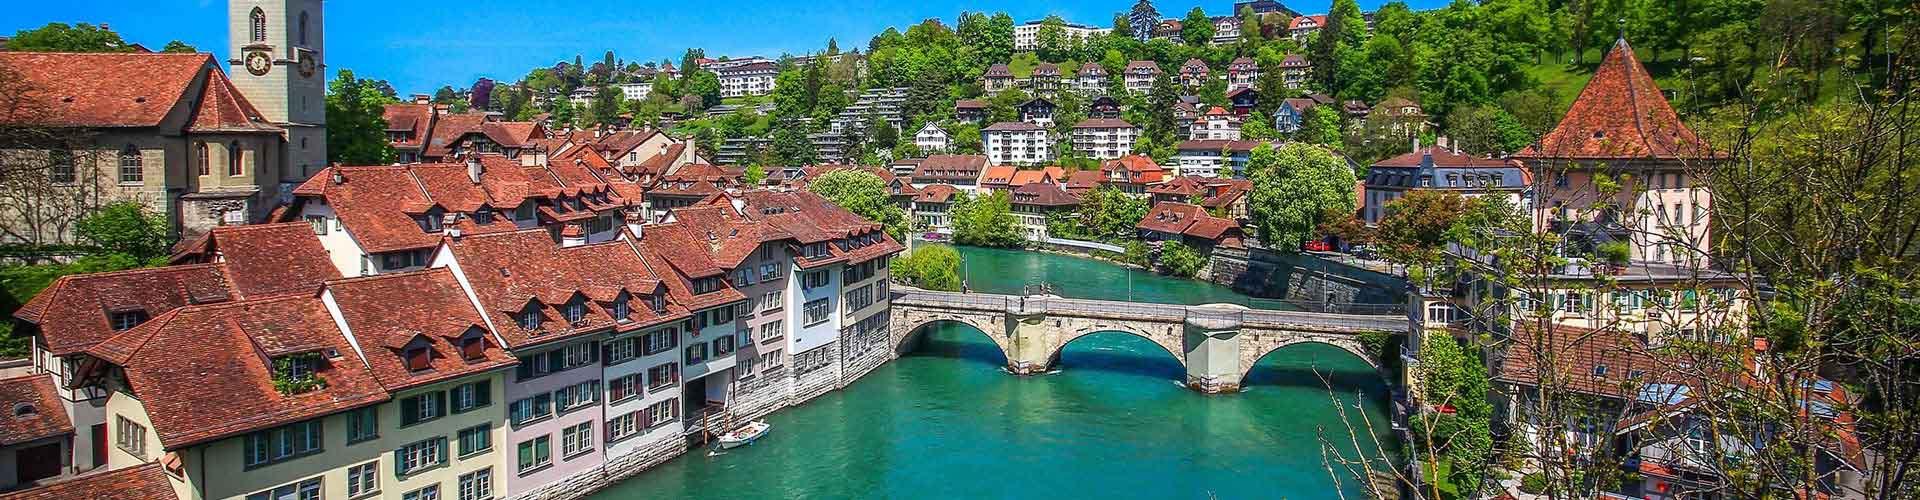 Berna - Apartamentos en Berna. Mapas de Berna, Fotos y comentarios de cada Apartamento en Berna.